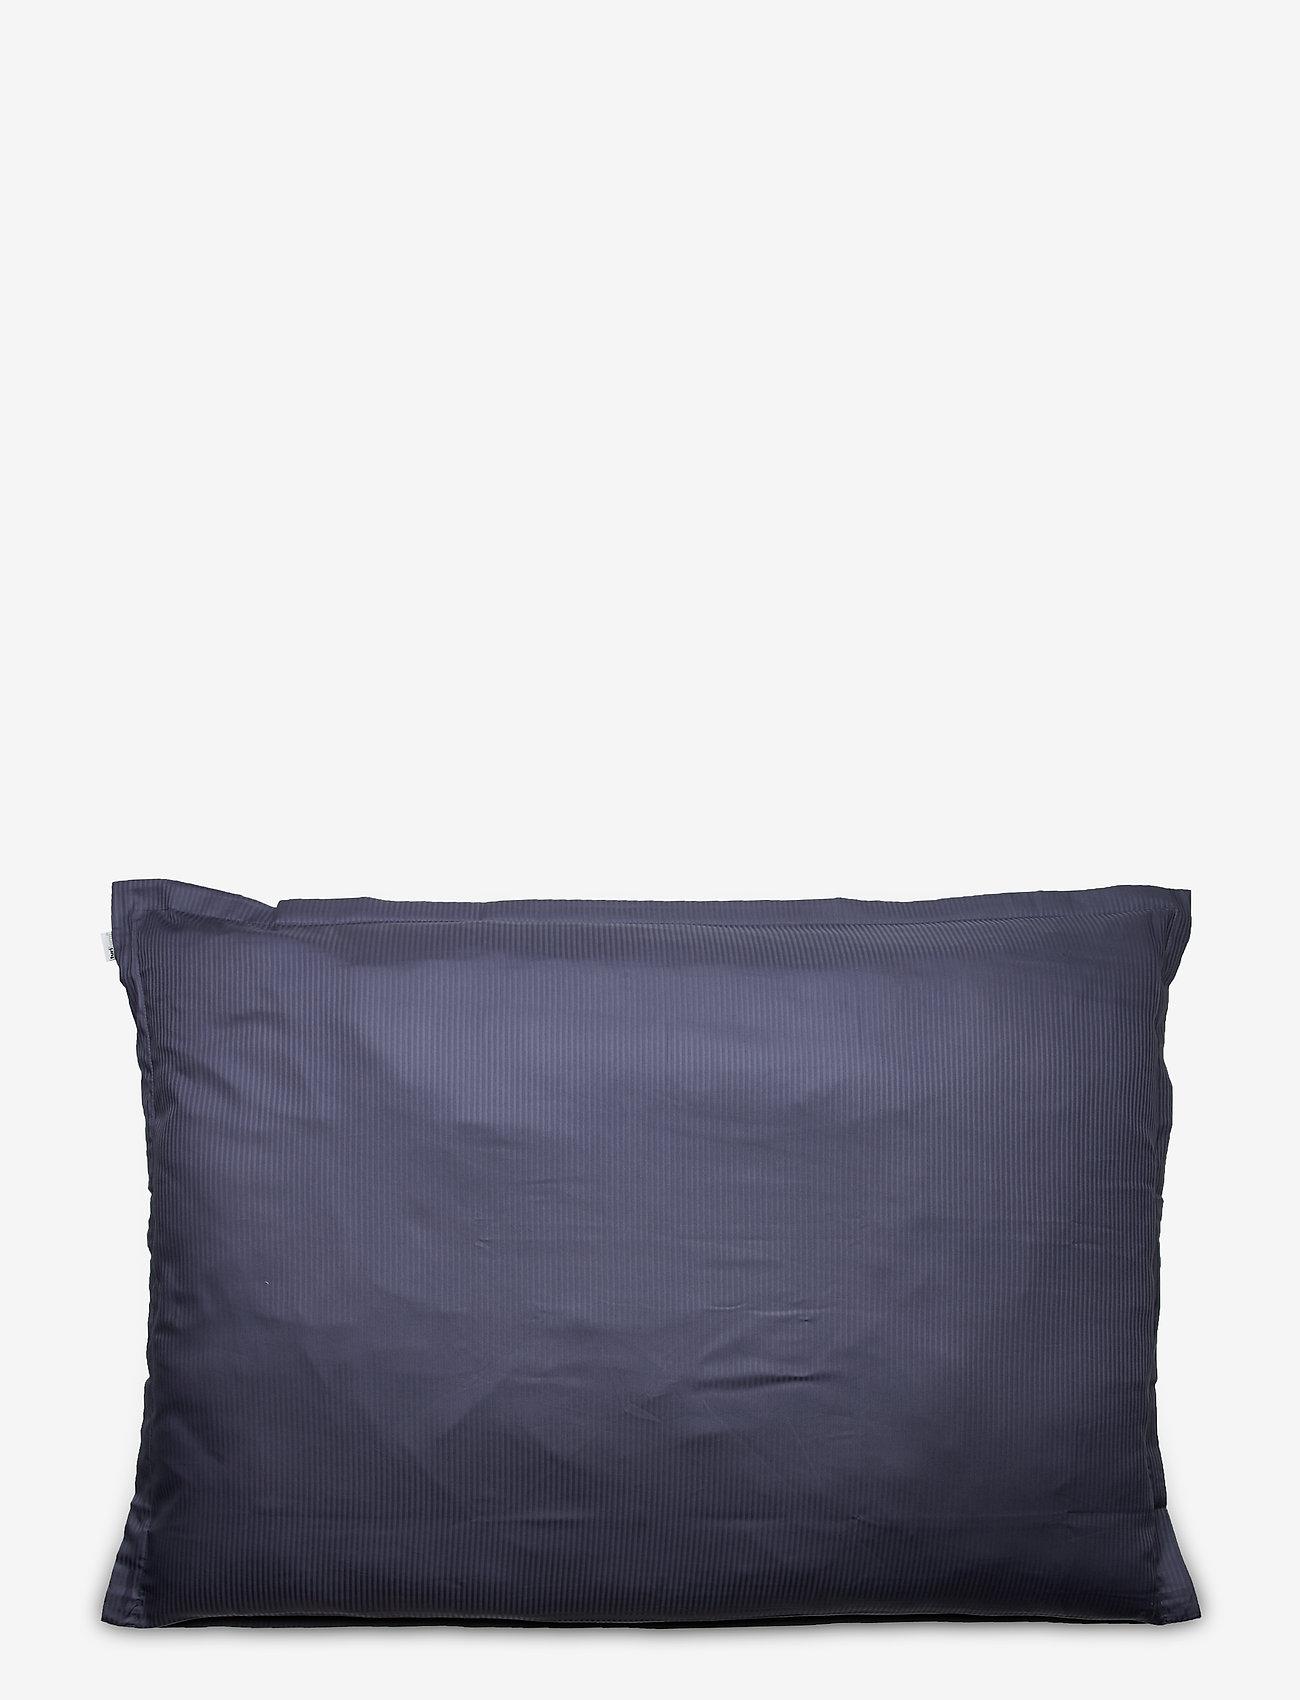 Turistripa Gots Dark Blue (Dark Blue) (32.03 €) - Turiform WrZ7C